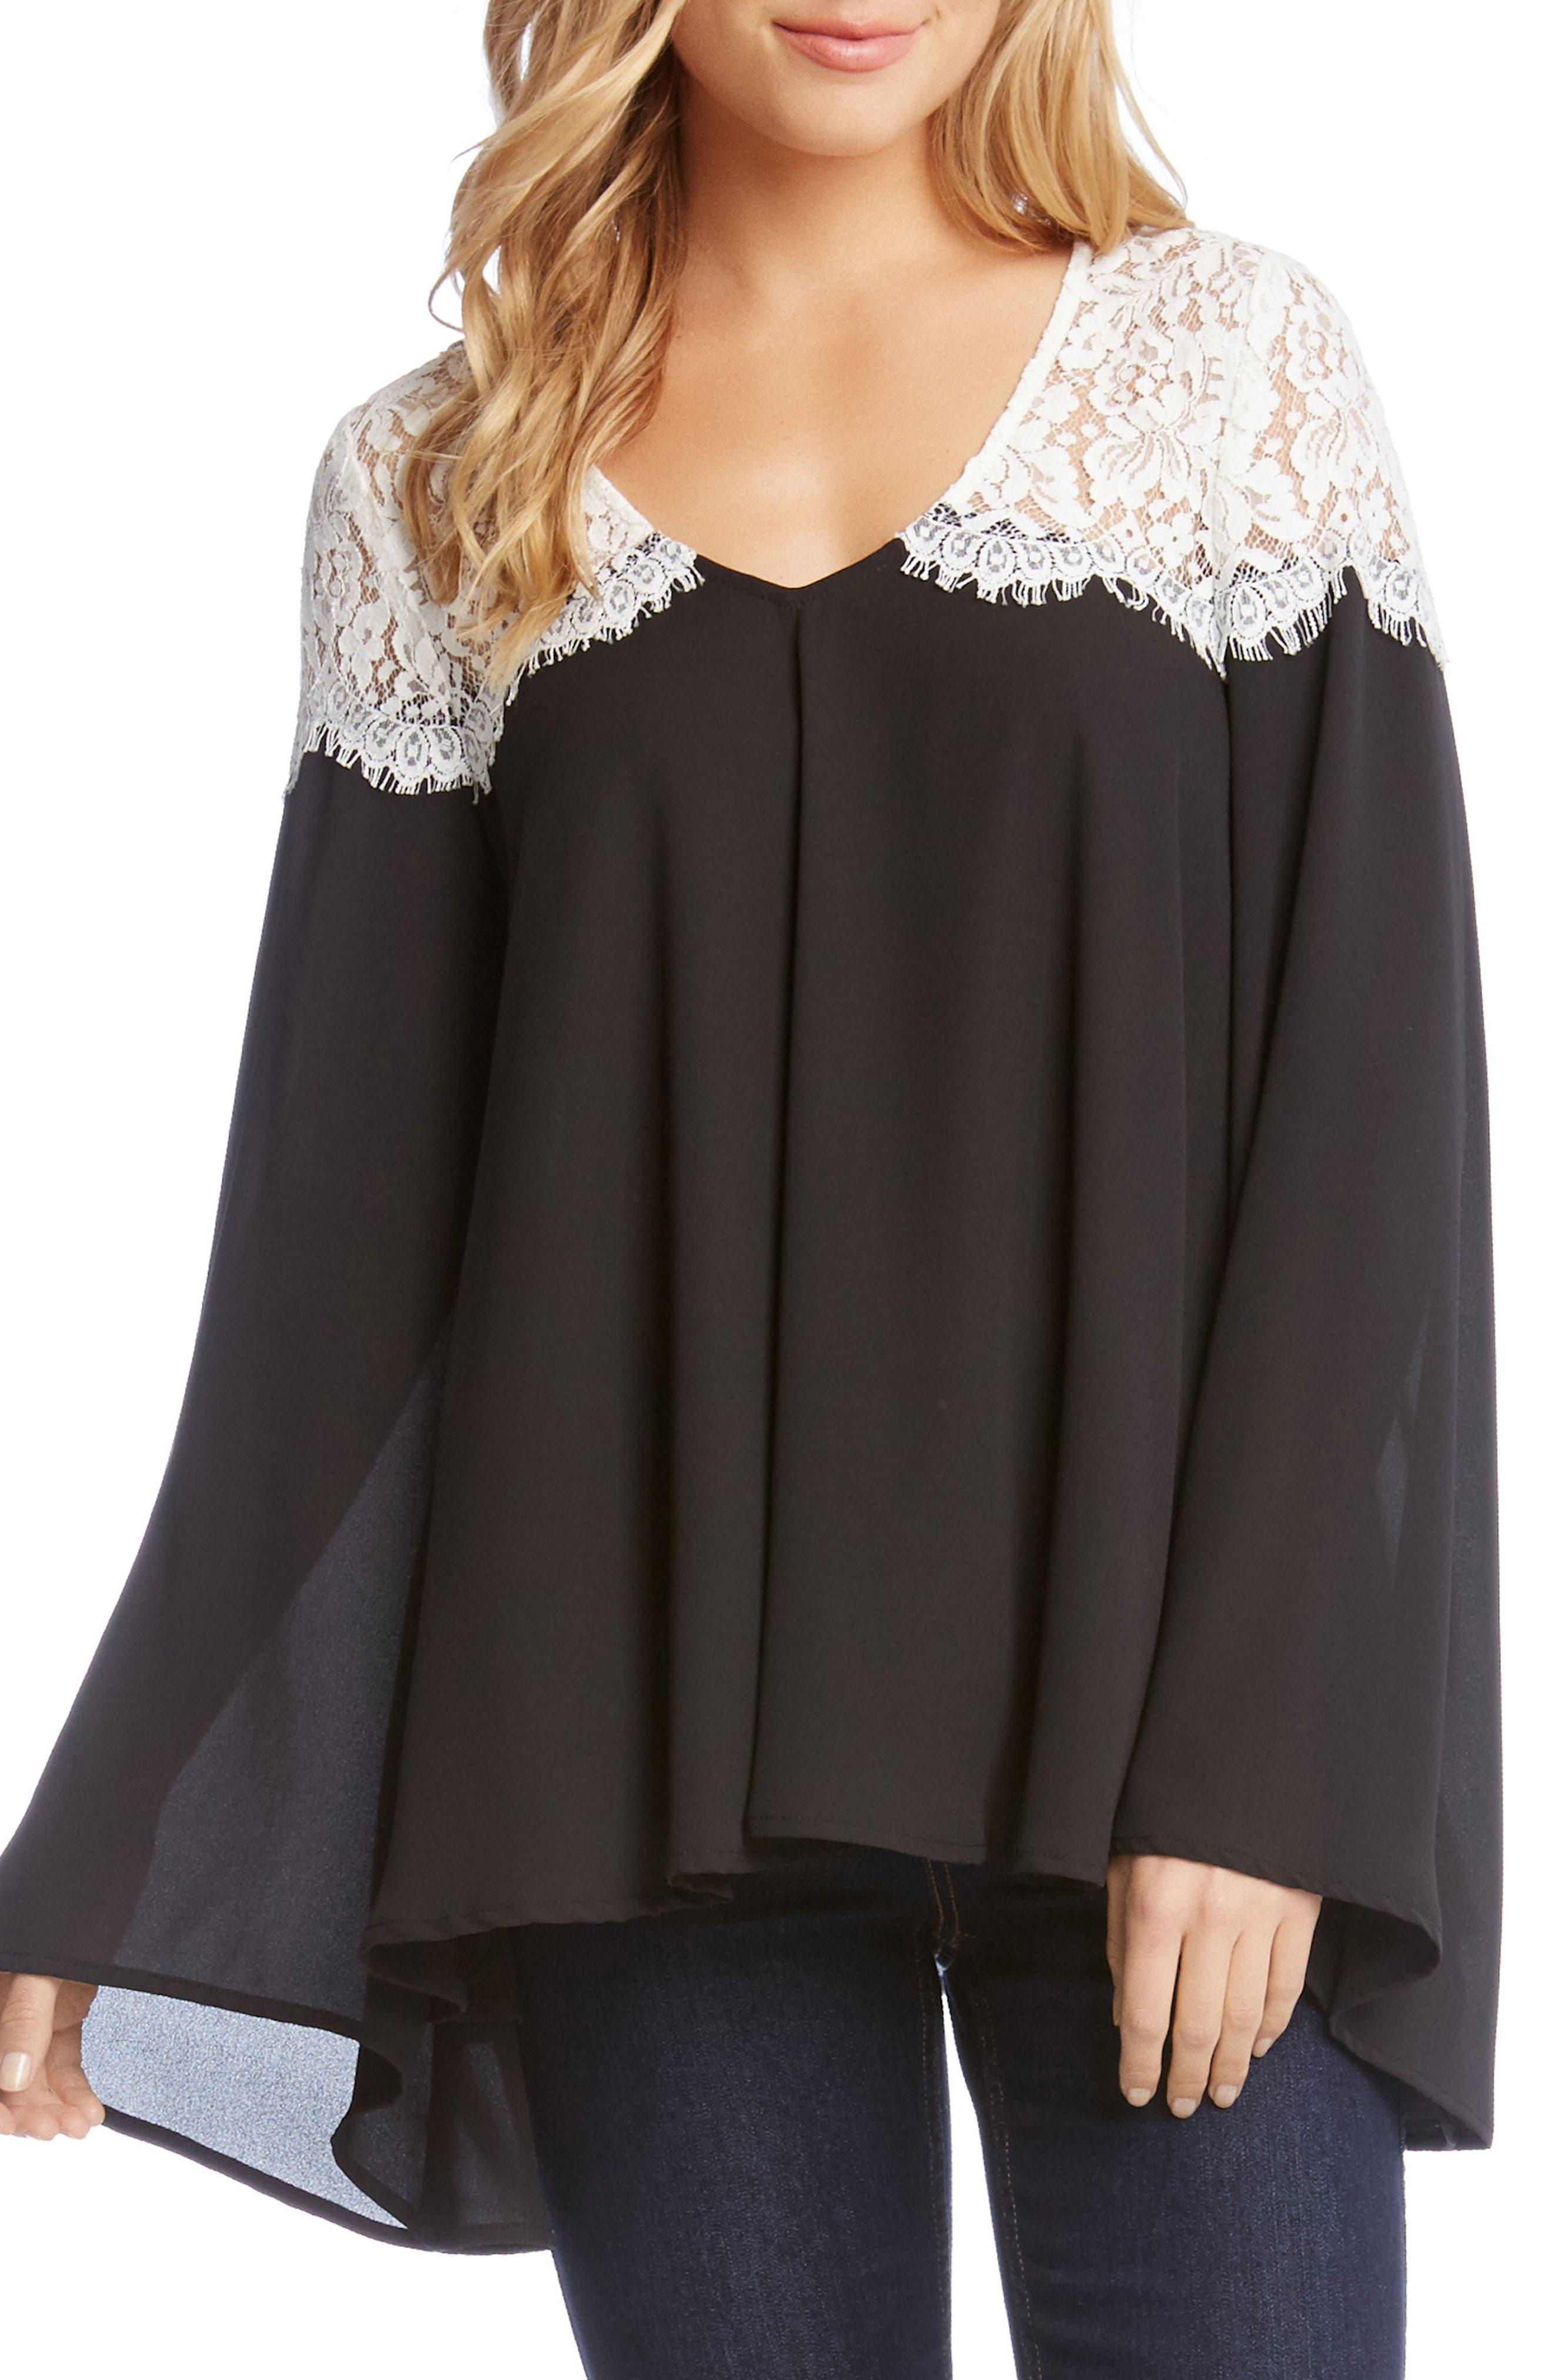 KAREN KANE Contrast Lace Bell Sleeve Top